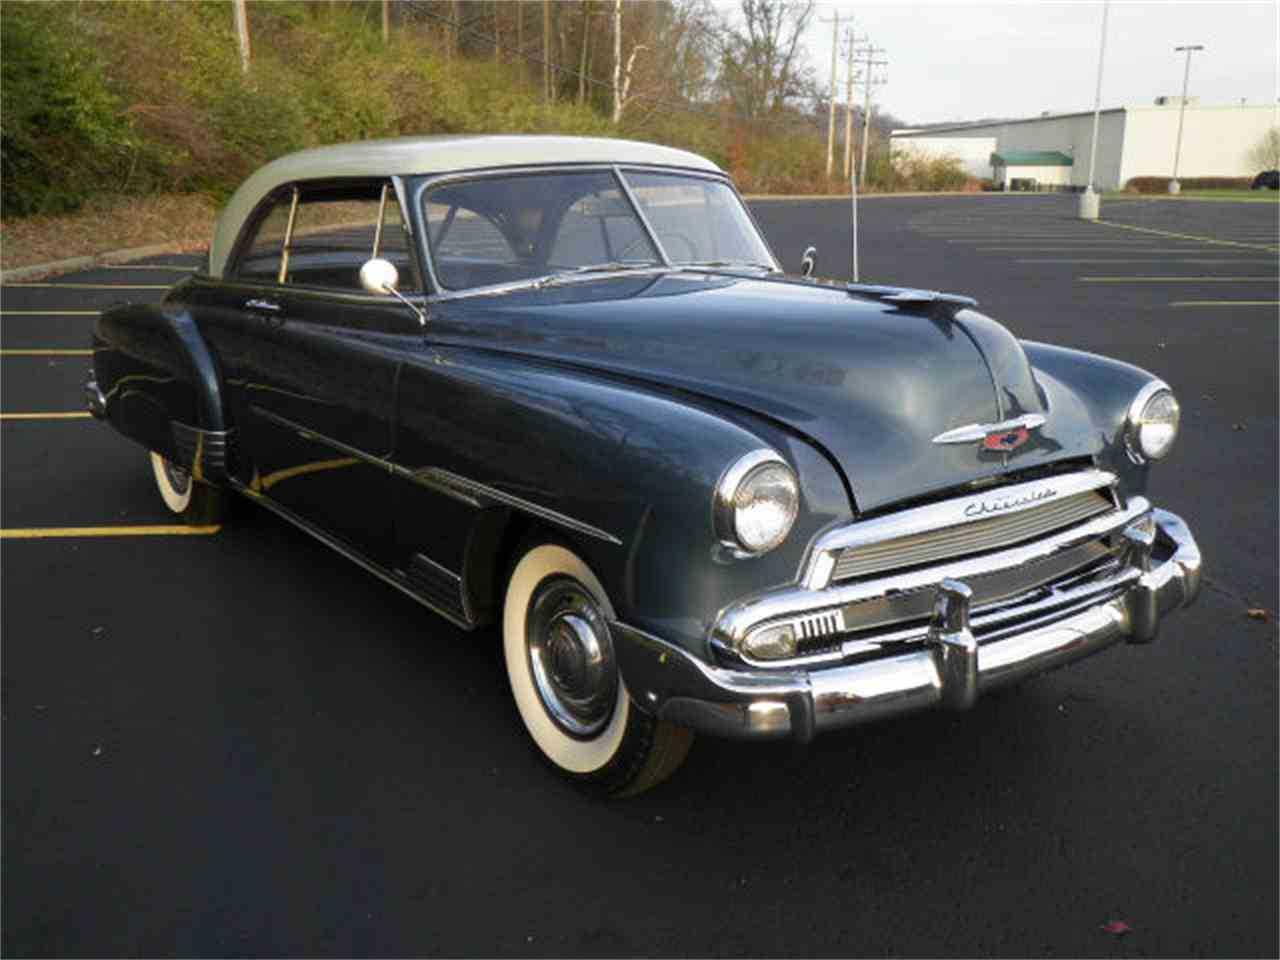 1951 Chevrolet Deluxe Bel Air Styleline For Sale In Milford Oh 4 Door